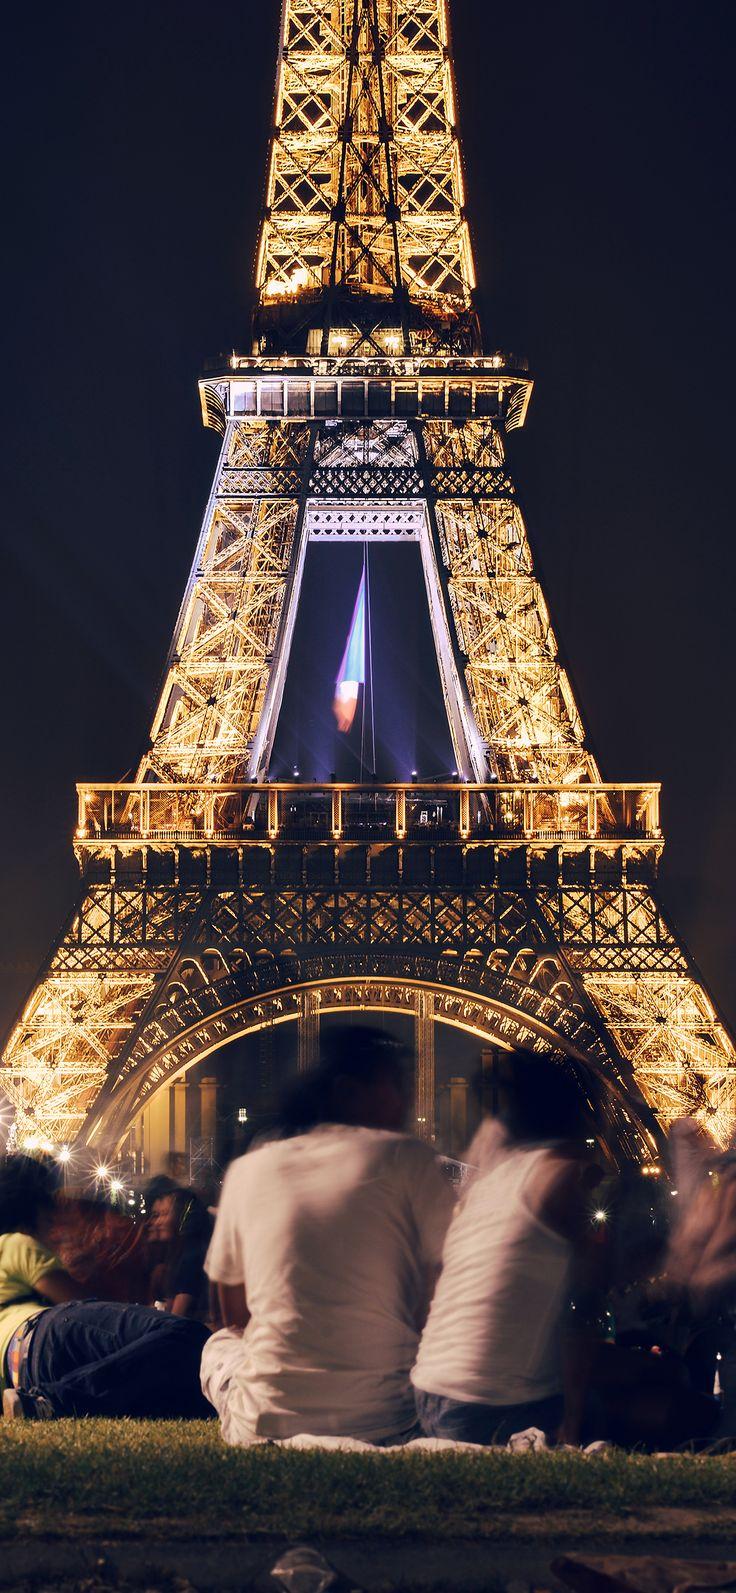 Iphone X Wallpaper Ms39 Happy Paris Eiffel Tower France